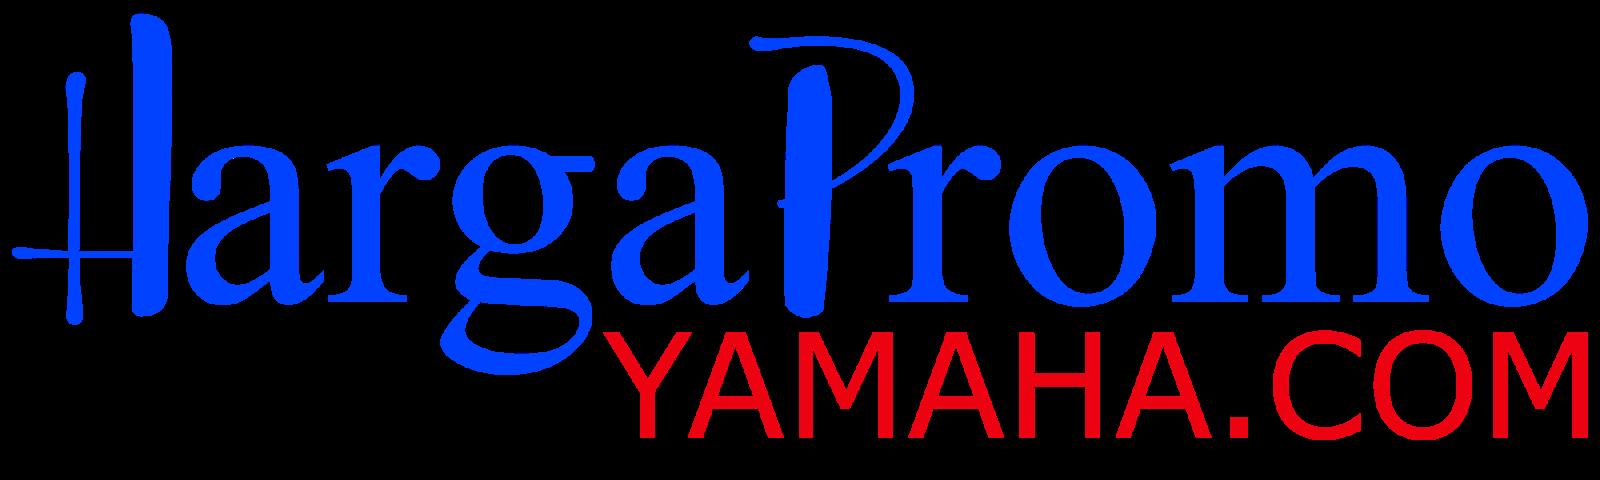 DEALER YAMAHA JAKARTA - KREDIT MOTOR YAMAHA